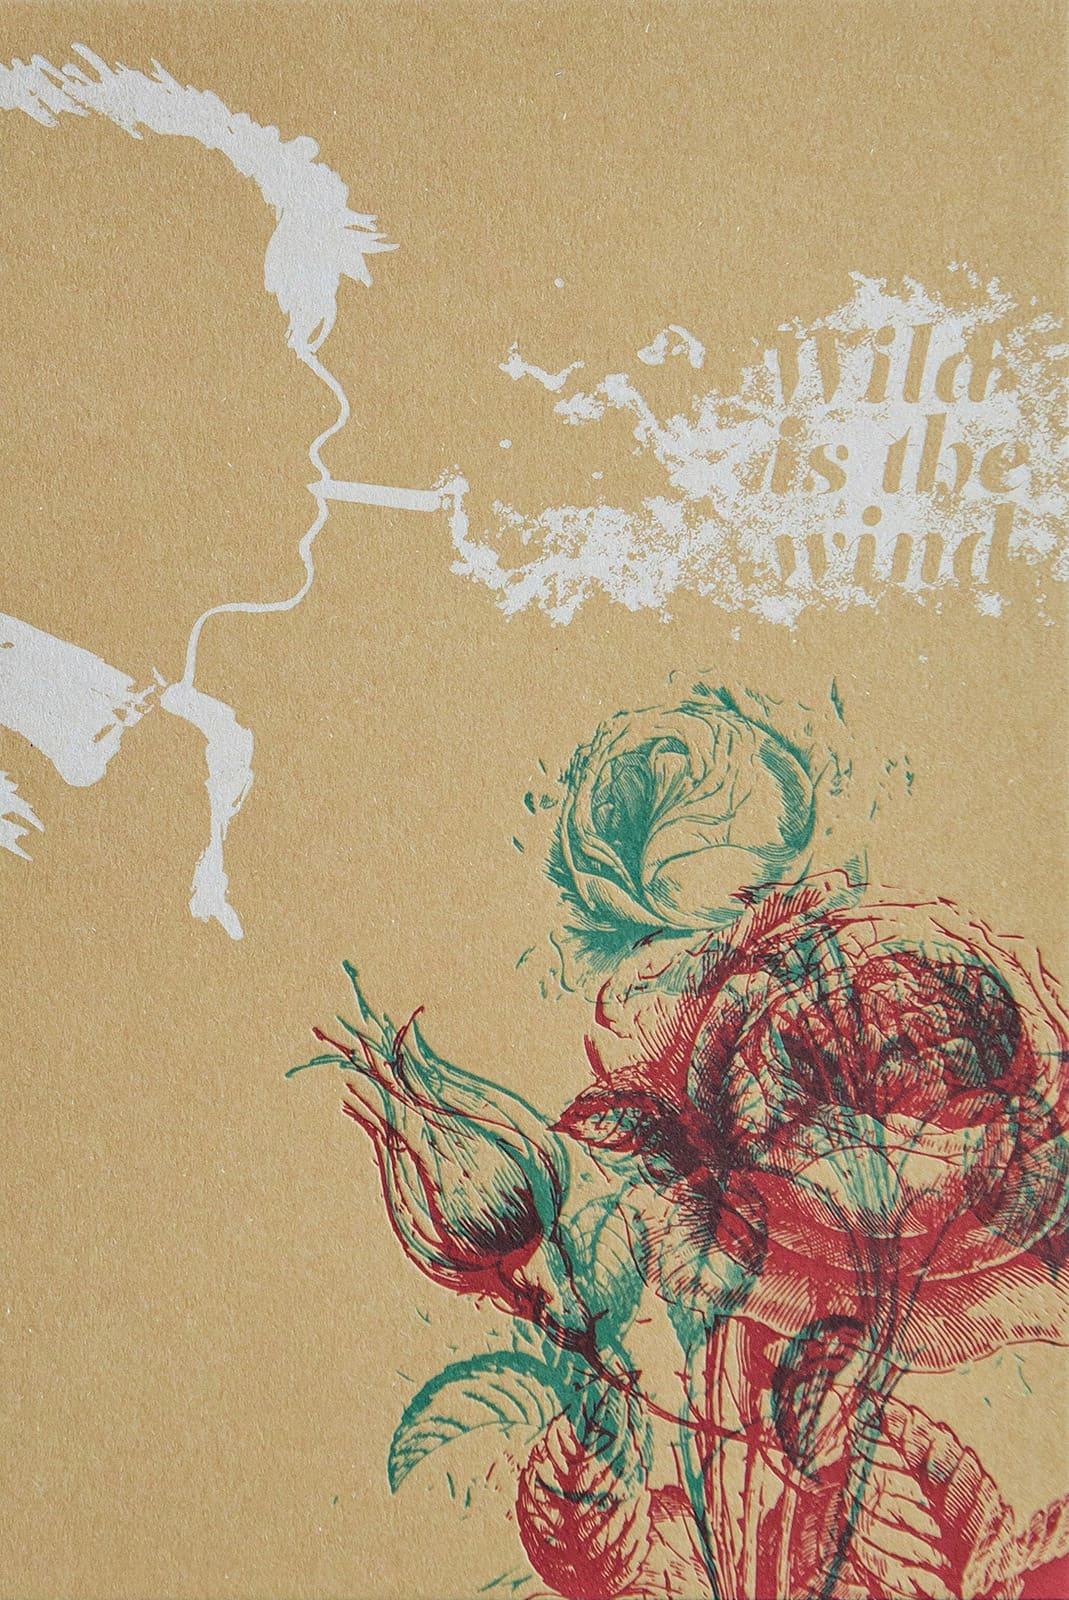 Bowie-Art-Print-Letterpress-wild-0